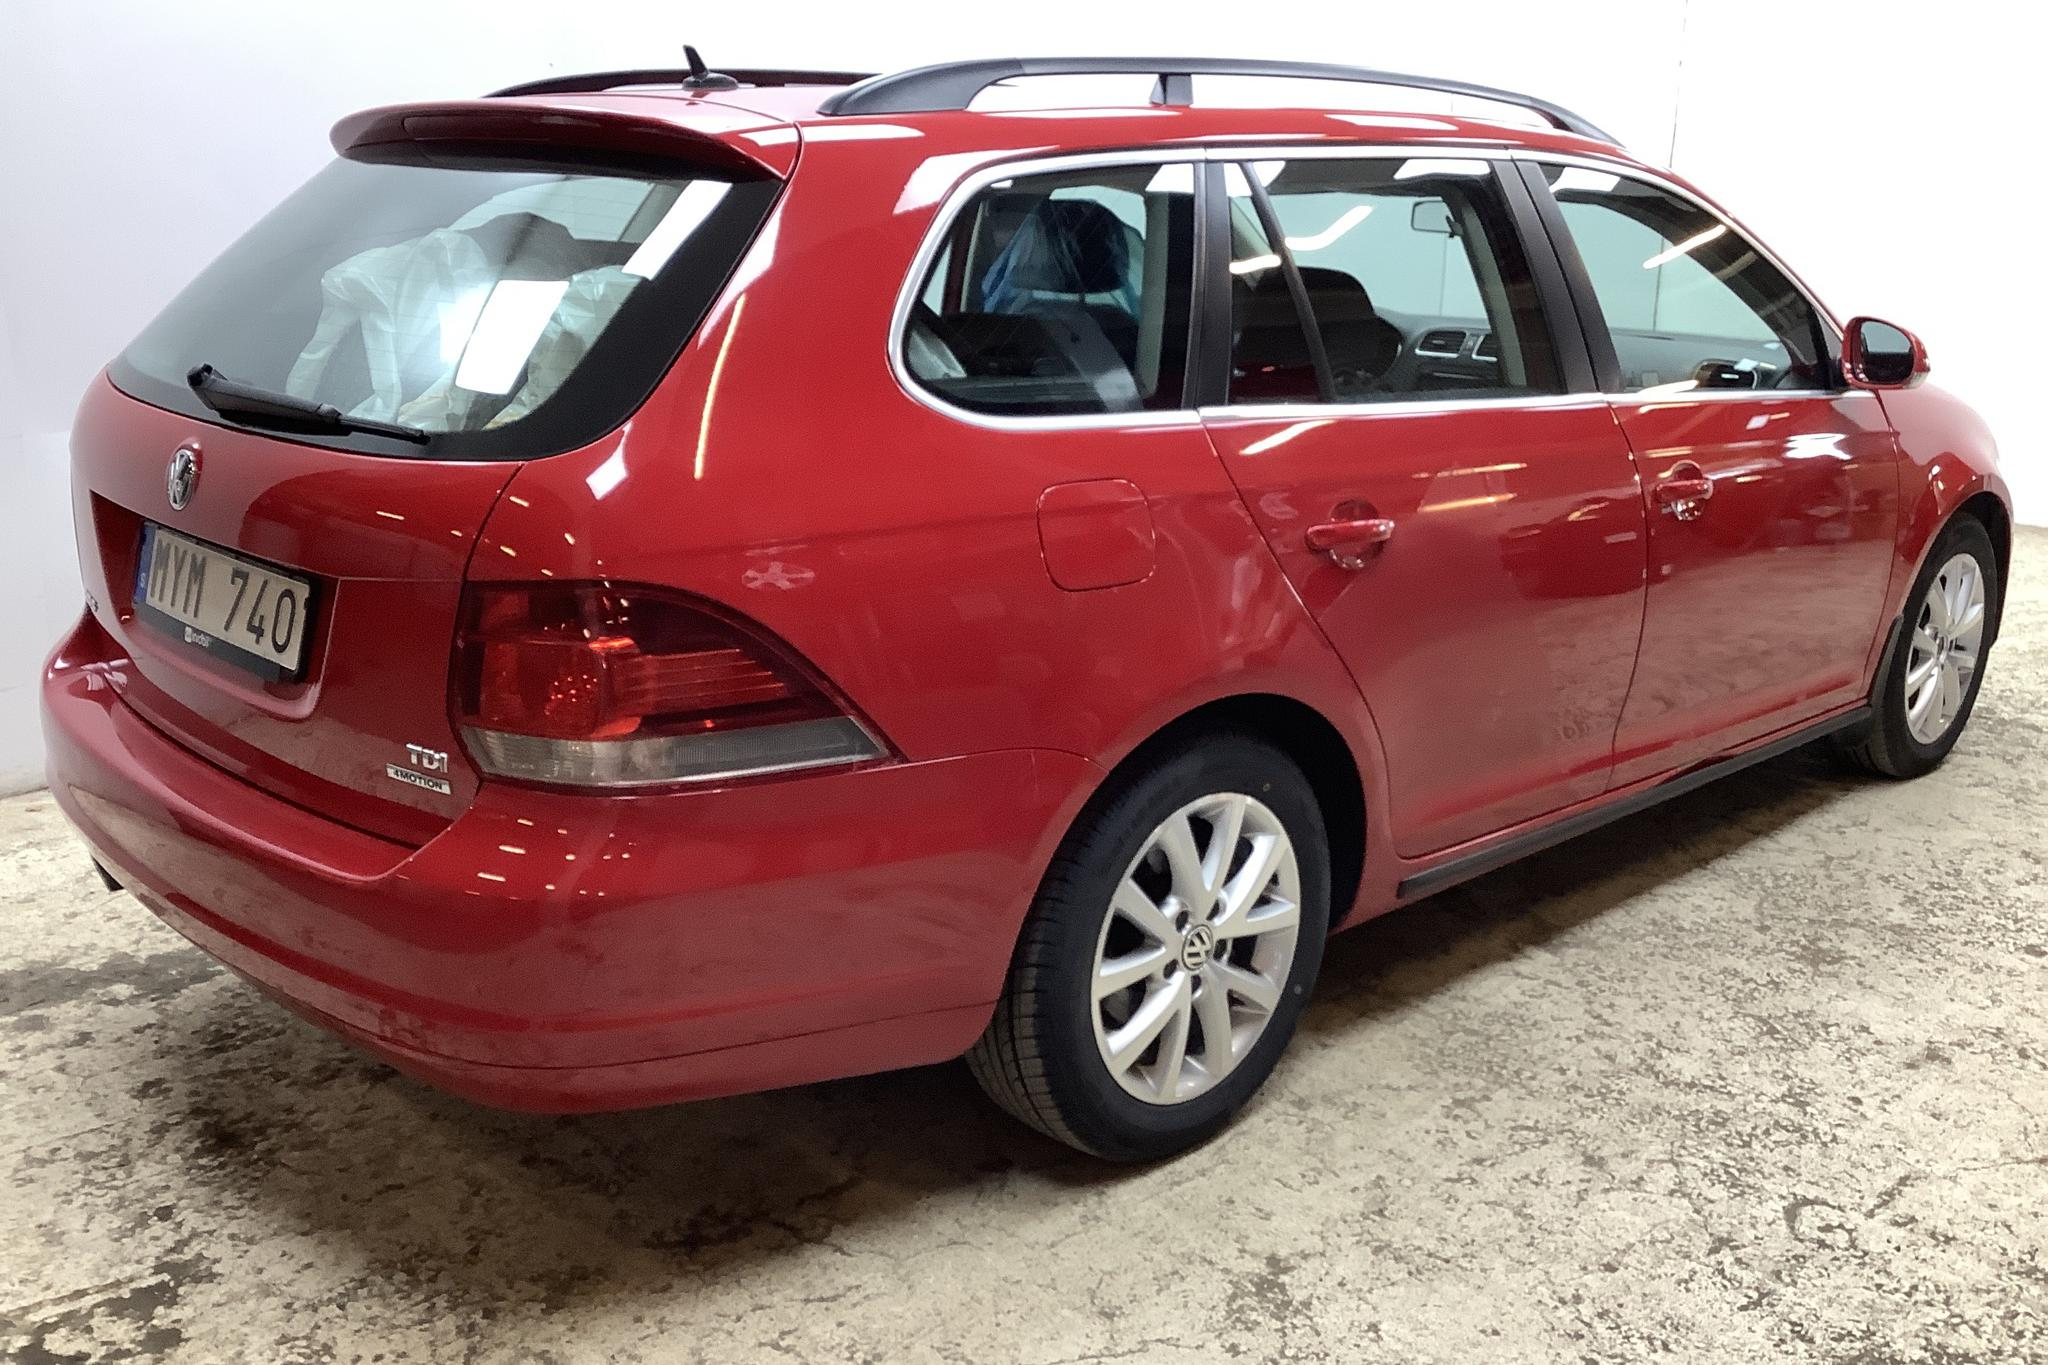 VW Golf VI 1.6 TDI Variant 4motion (105hk) - 106 670 km - Manual - red - 2013